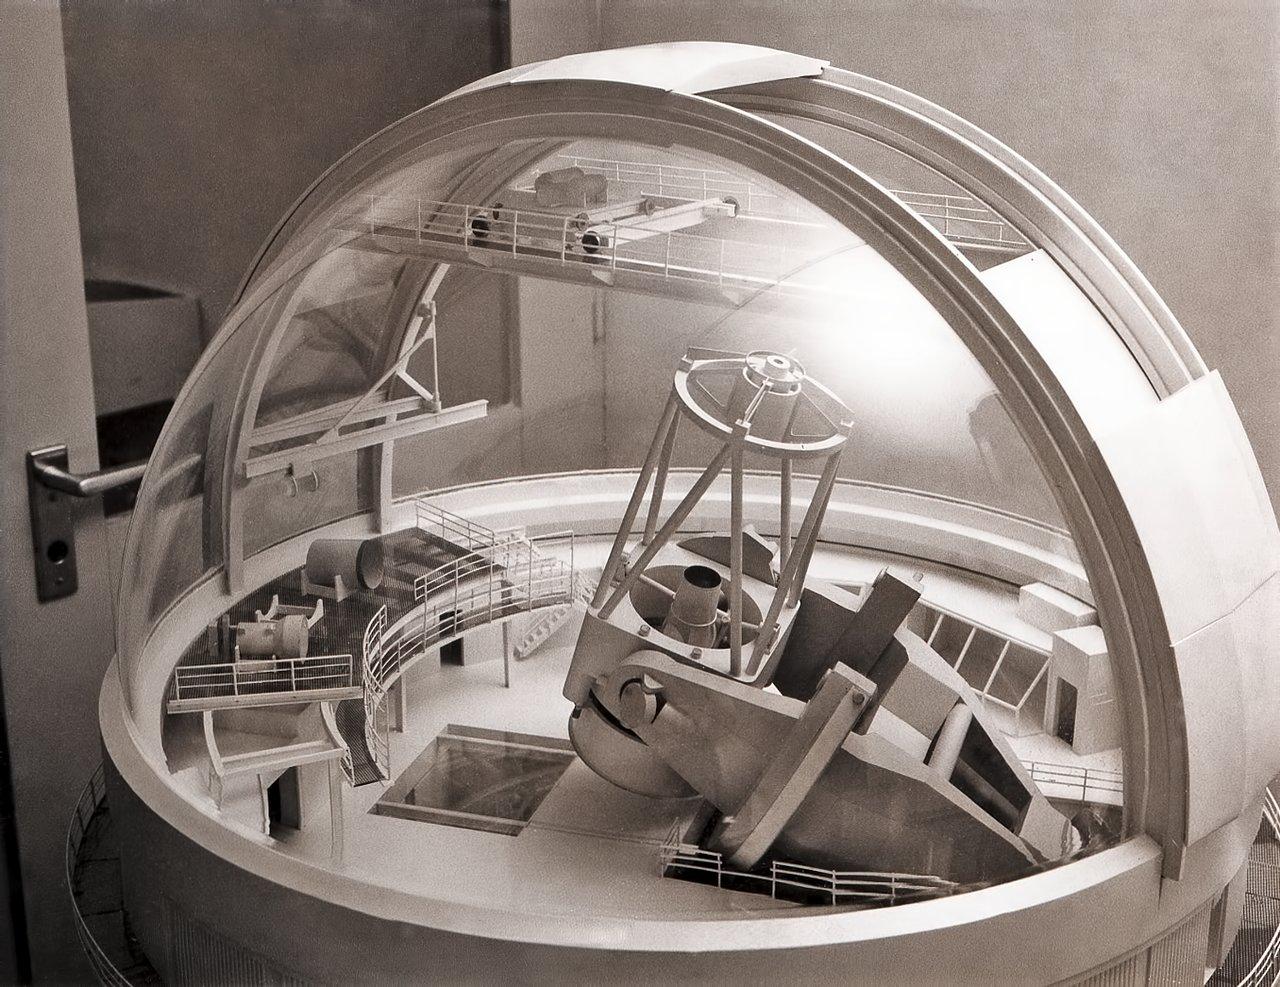 Model of the ESO 3.6-metre telescope